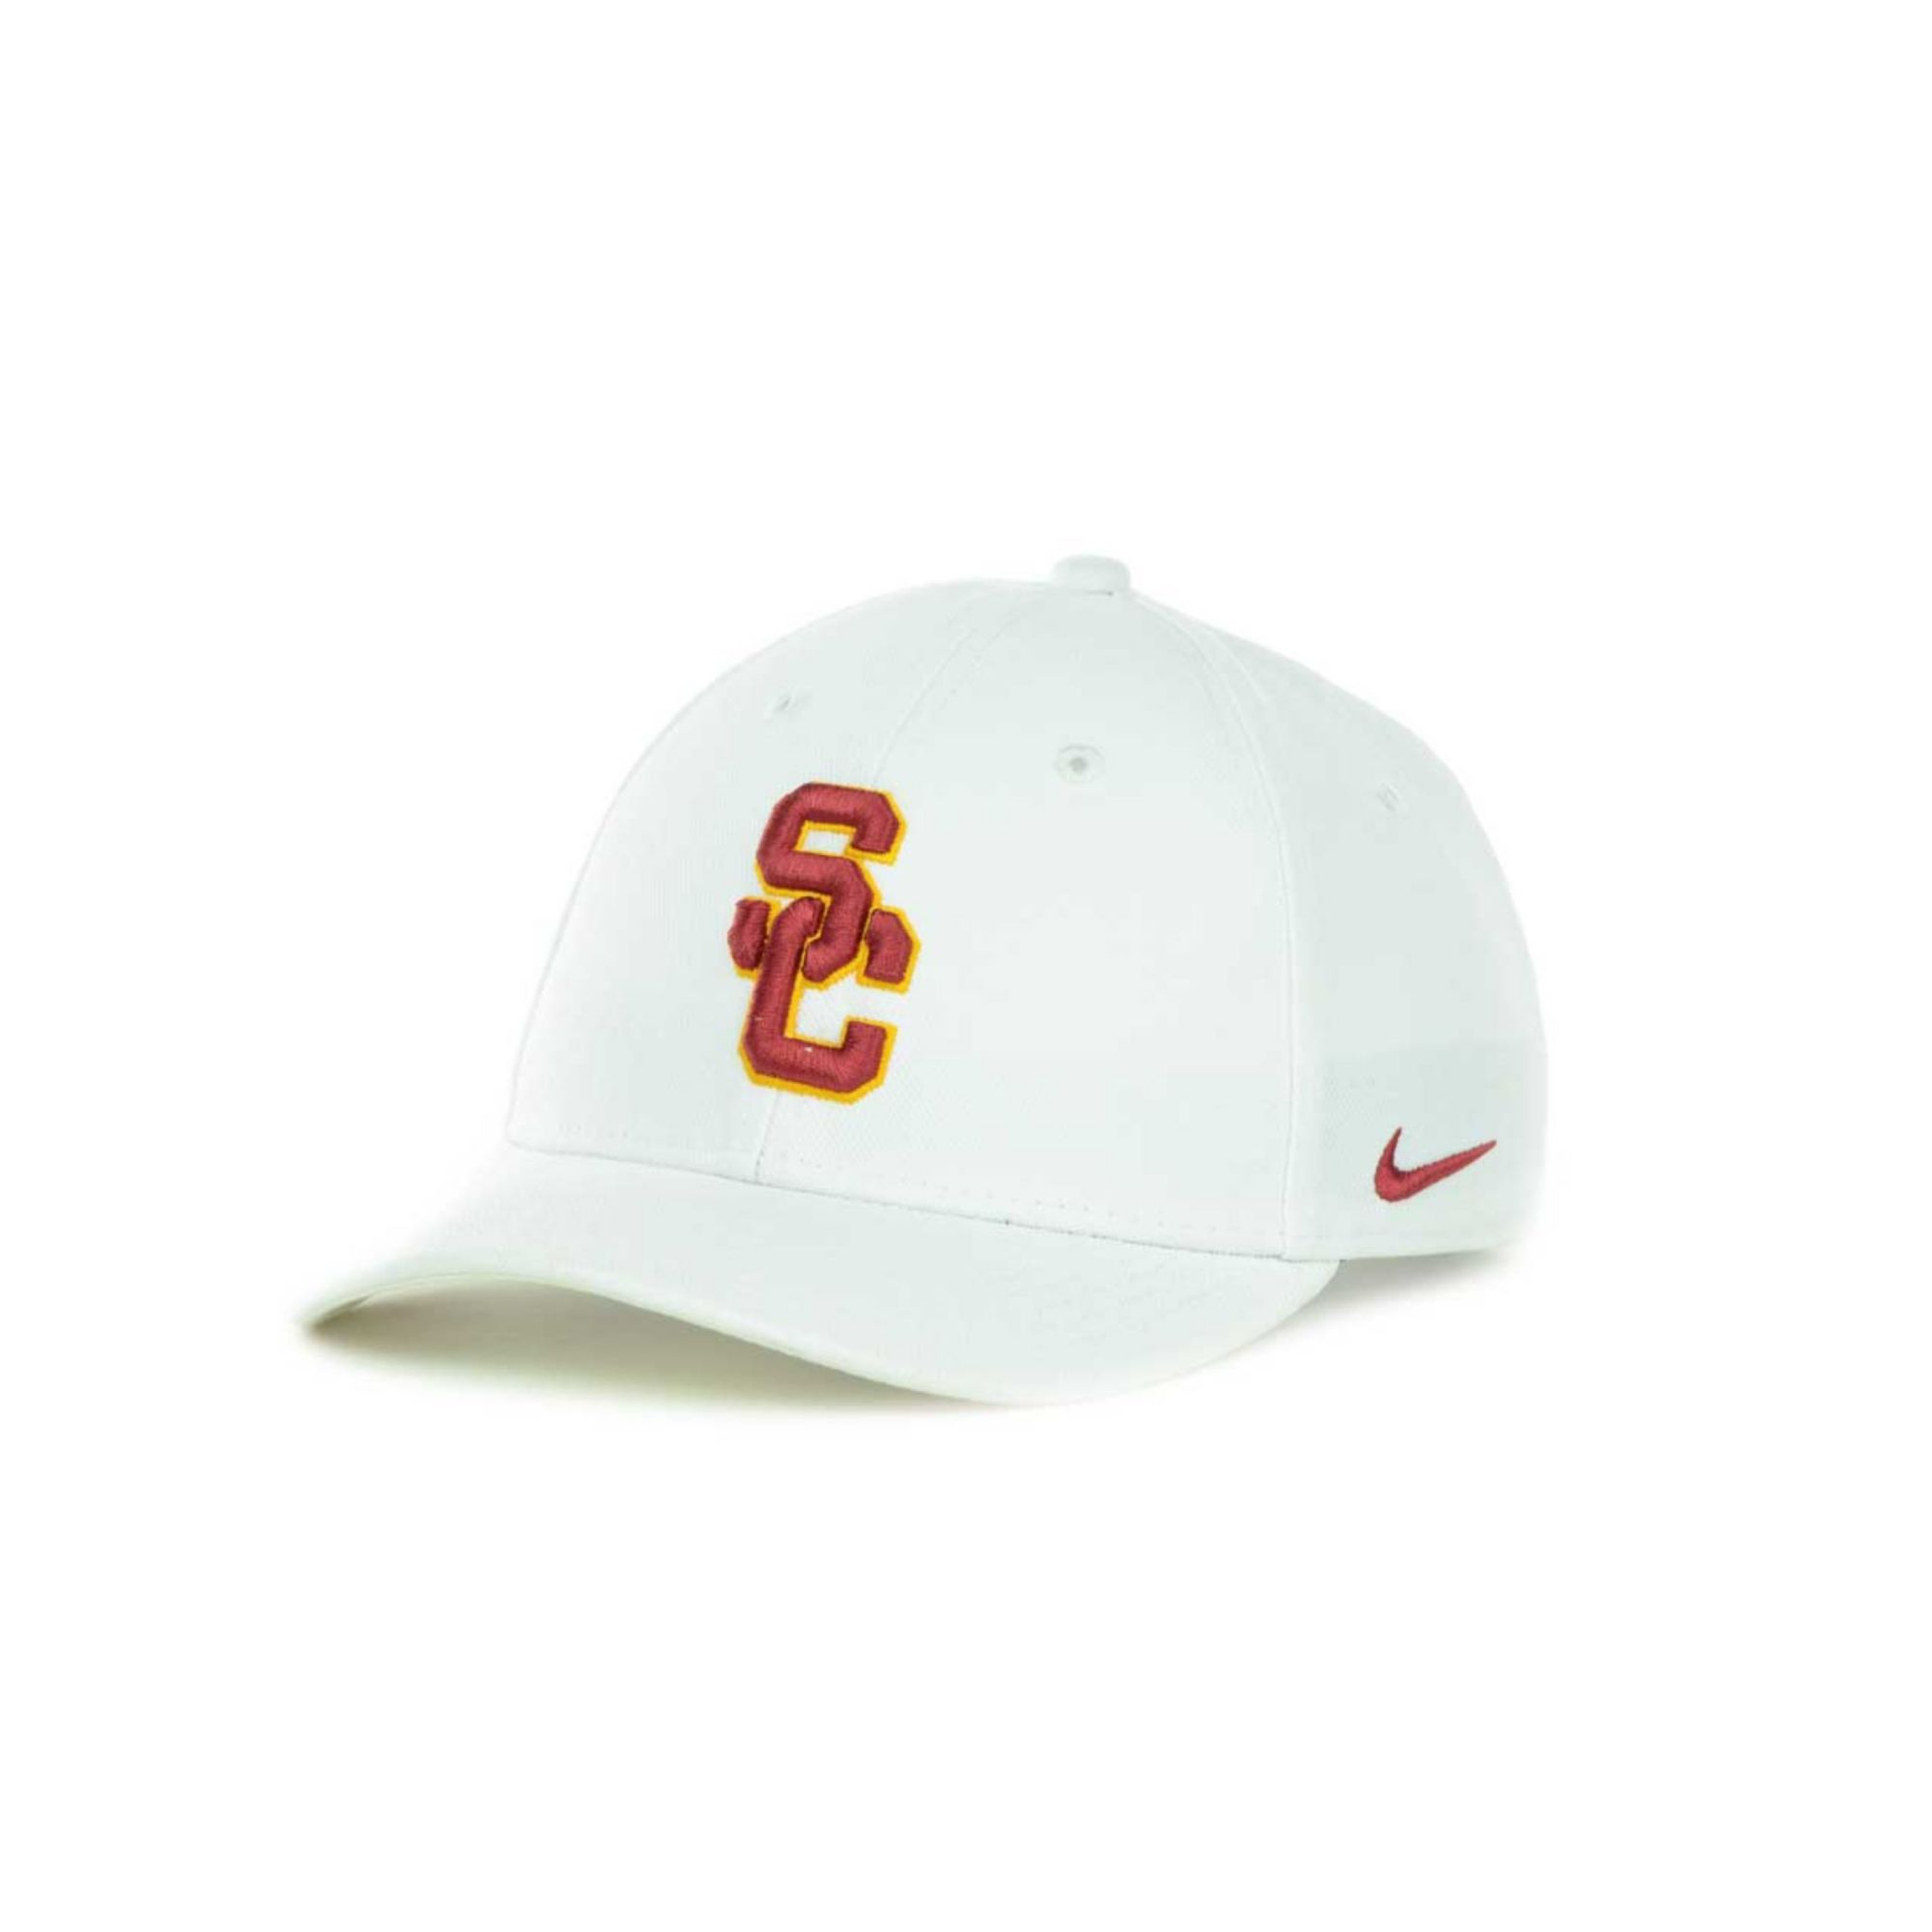 9aa038a44deae Nike Usc Trojans Drifit Classic Cap in White for Men - Lyst